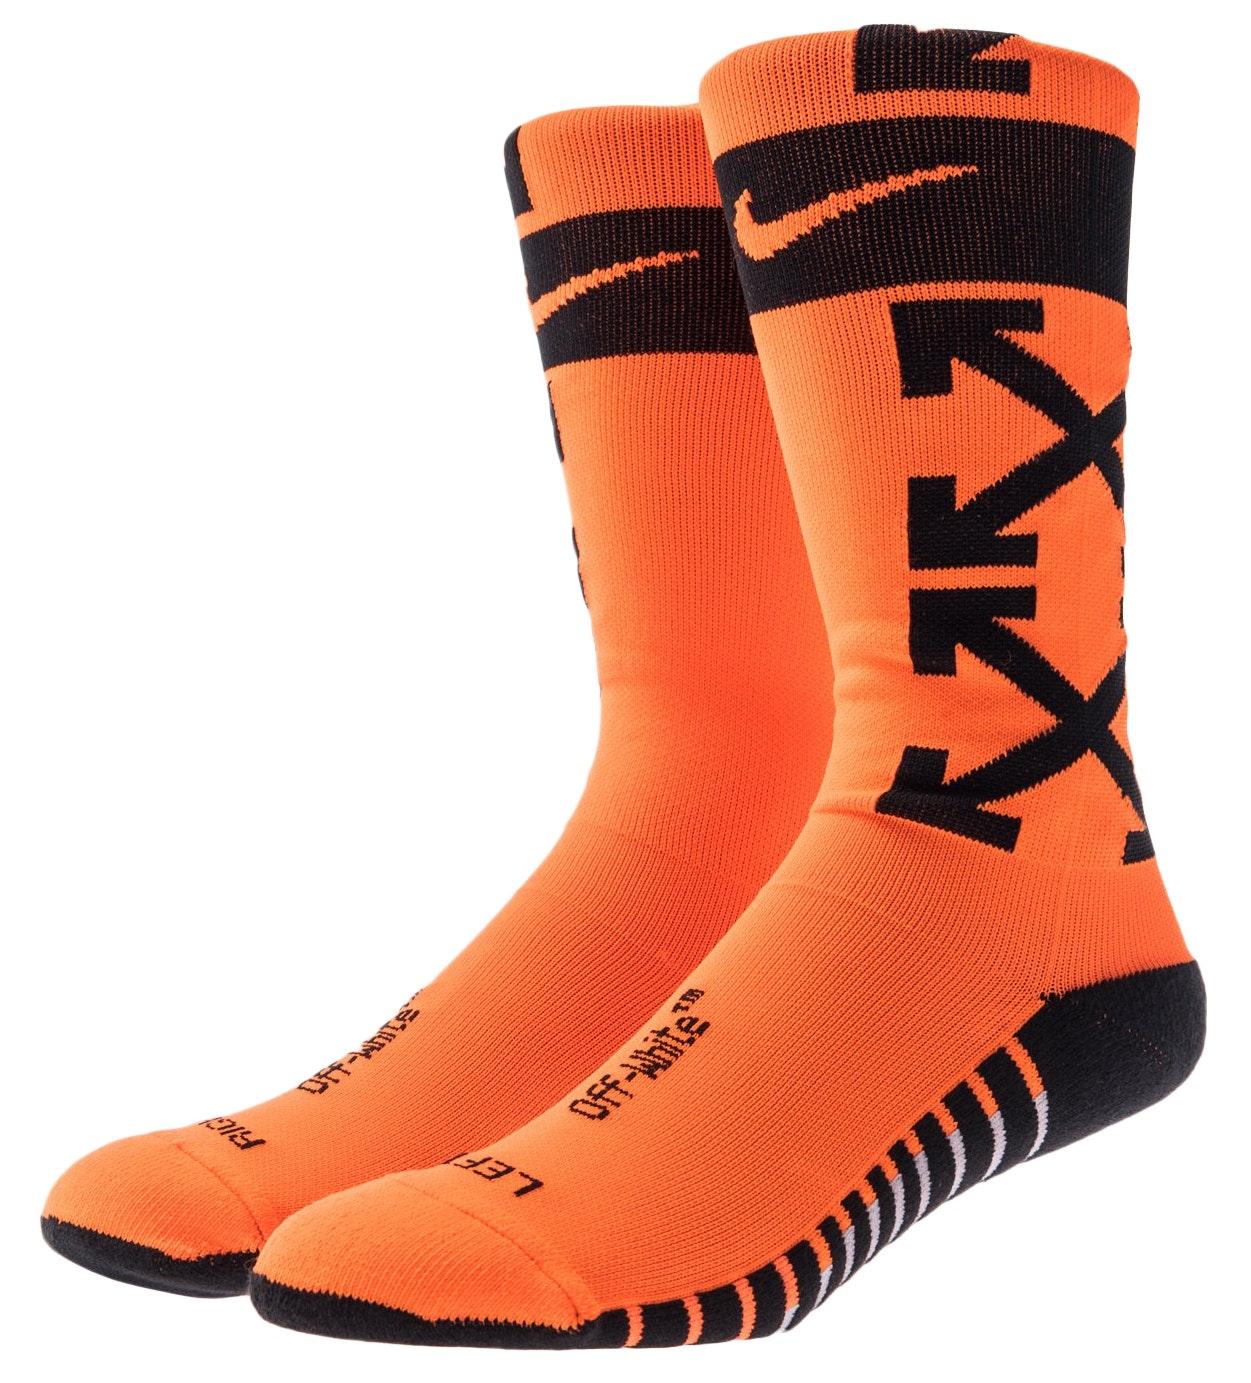 Nikelab x OFF-WHITE FB Socks Orange